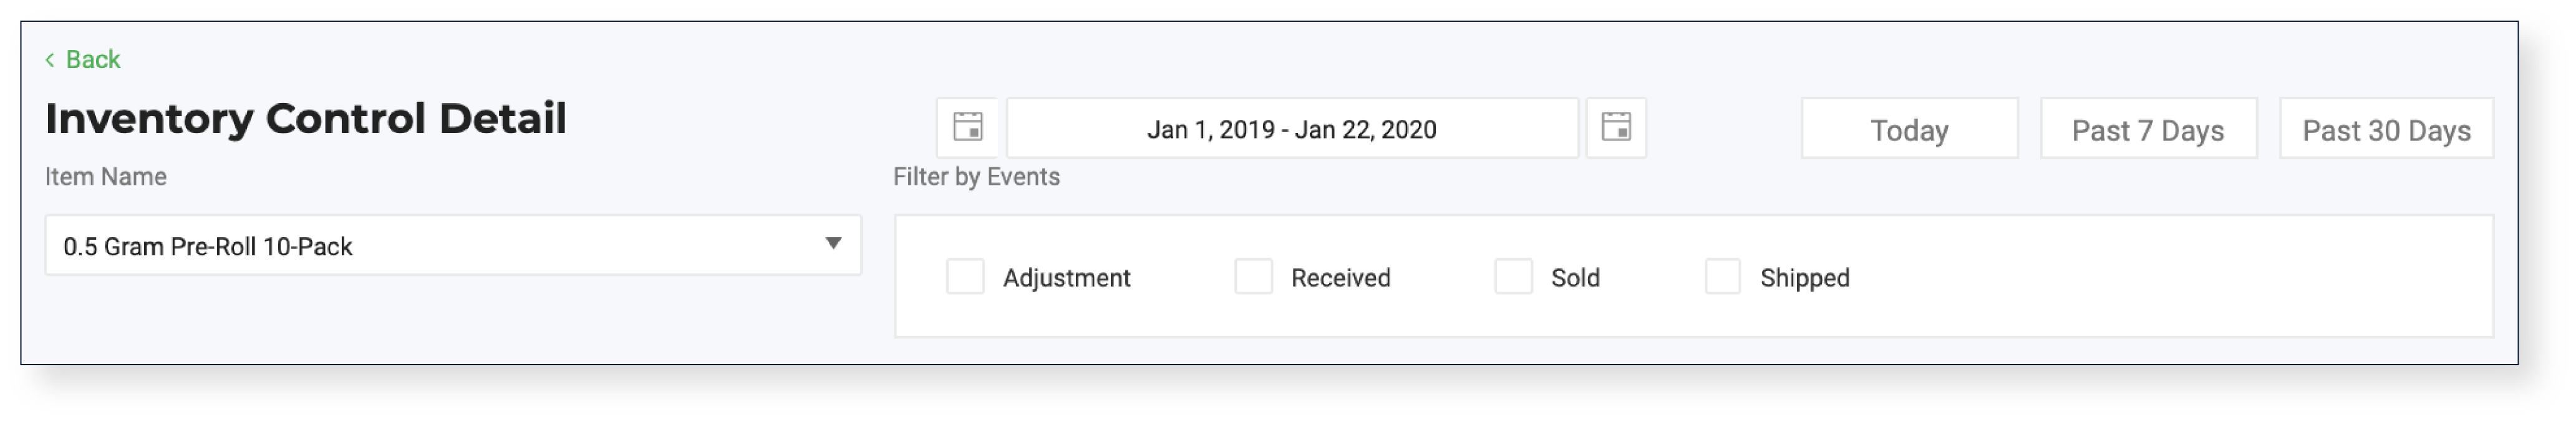 Flourish Software_Inventory Control